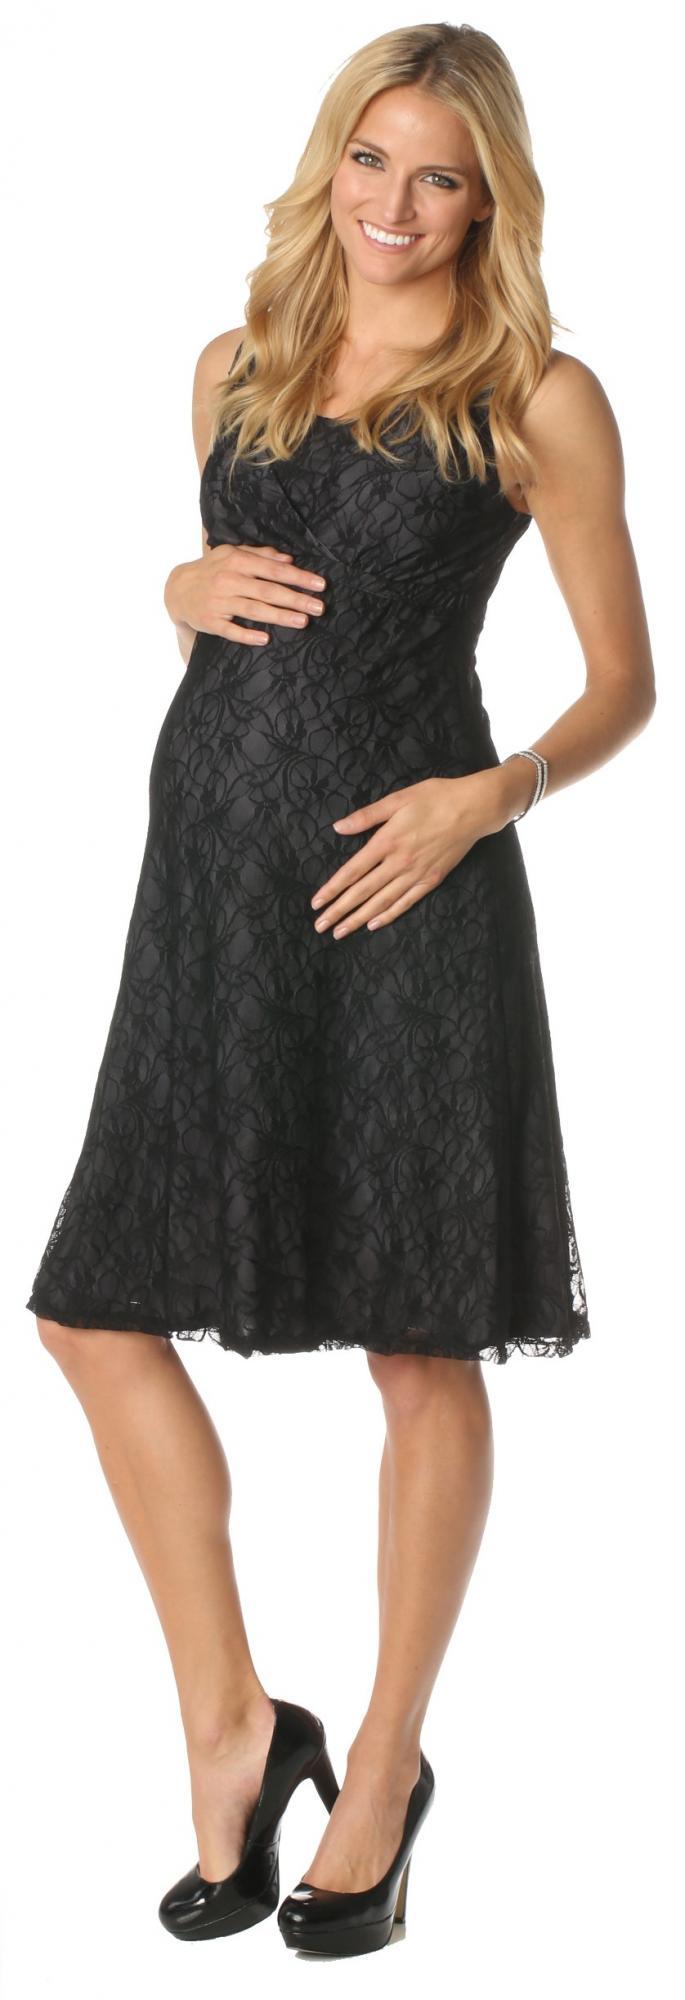 majamas-market-nursing-dress-blacklace-pregnant.jpg